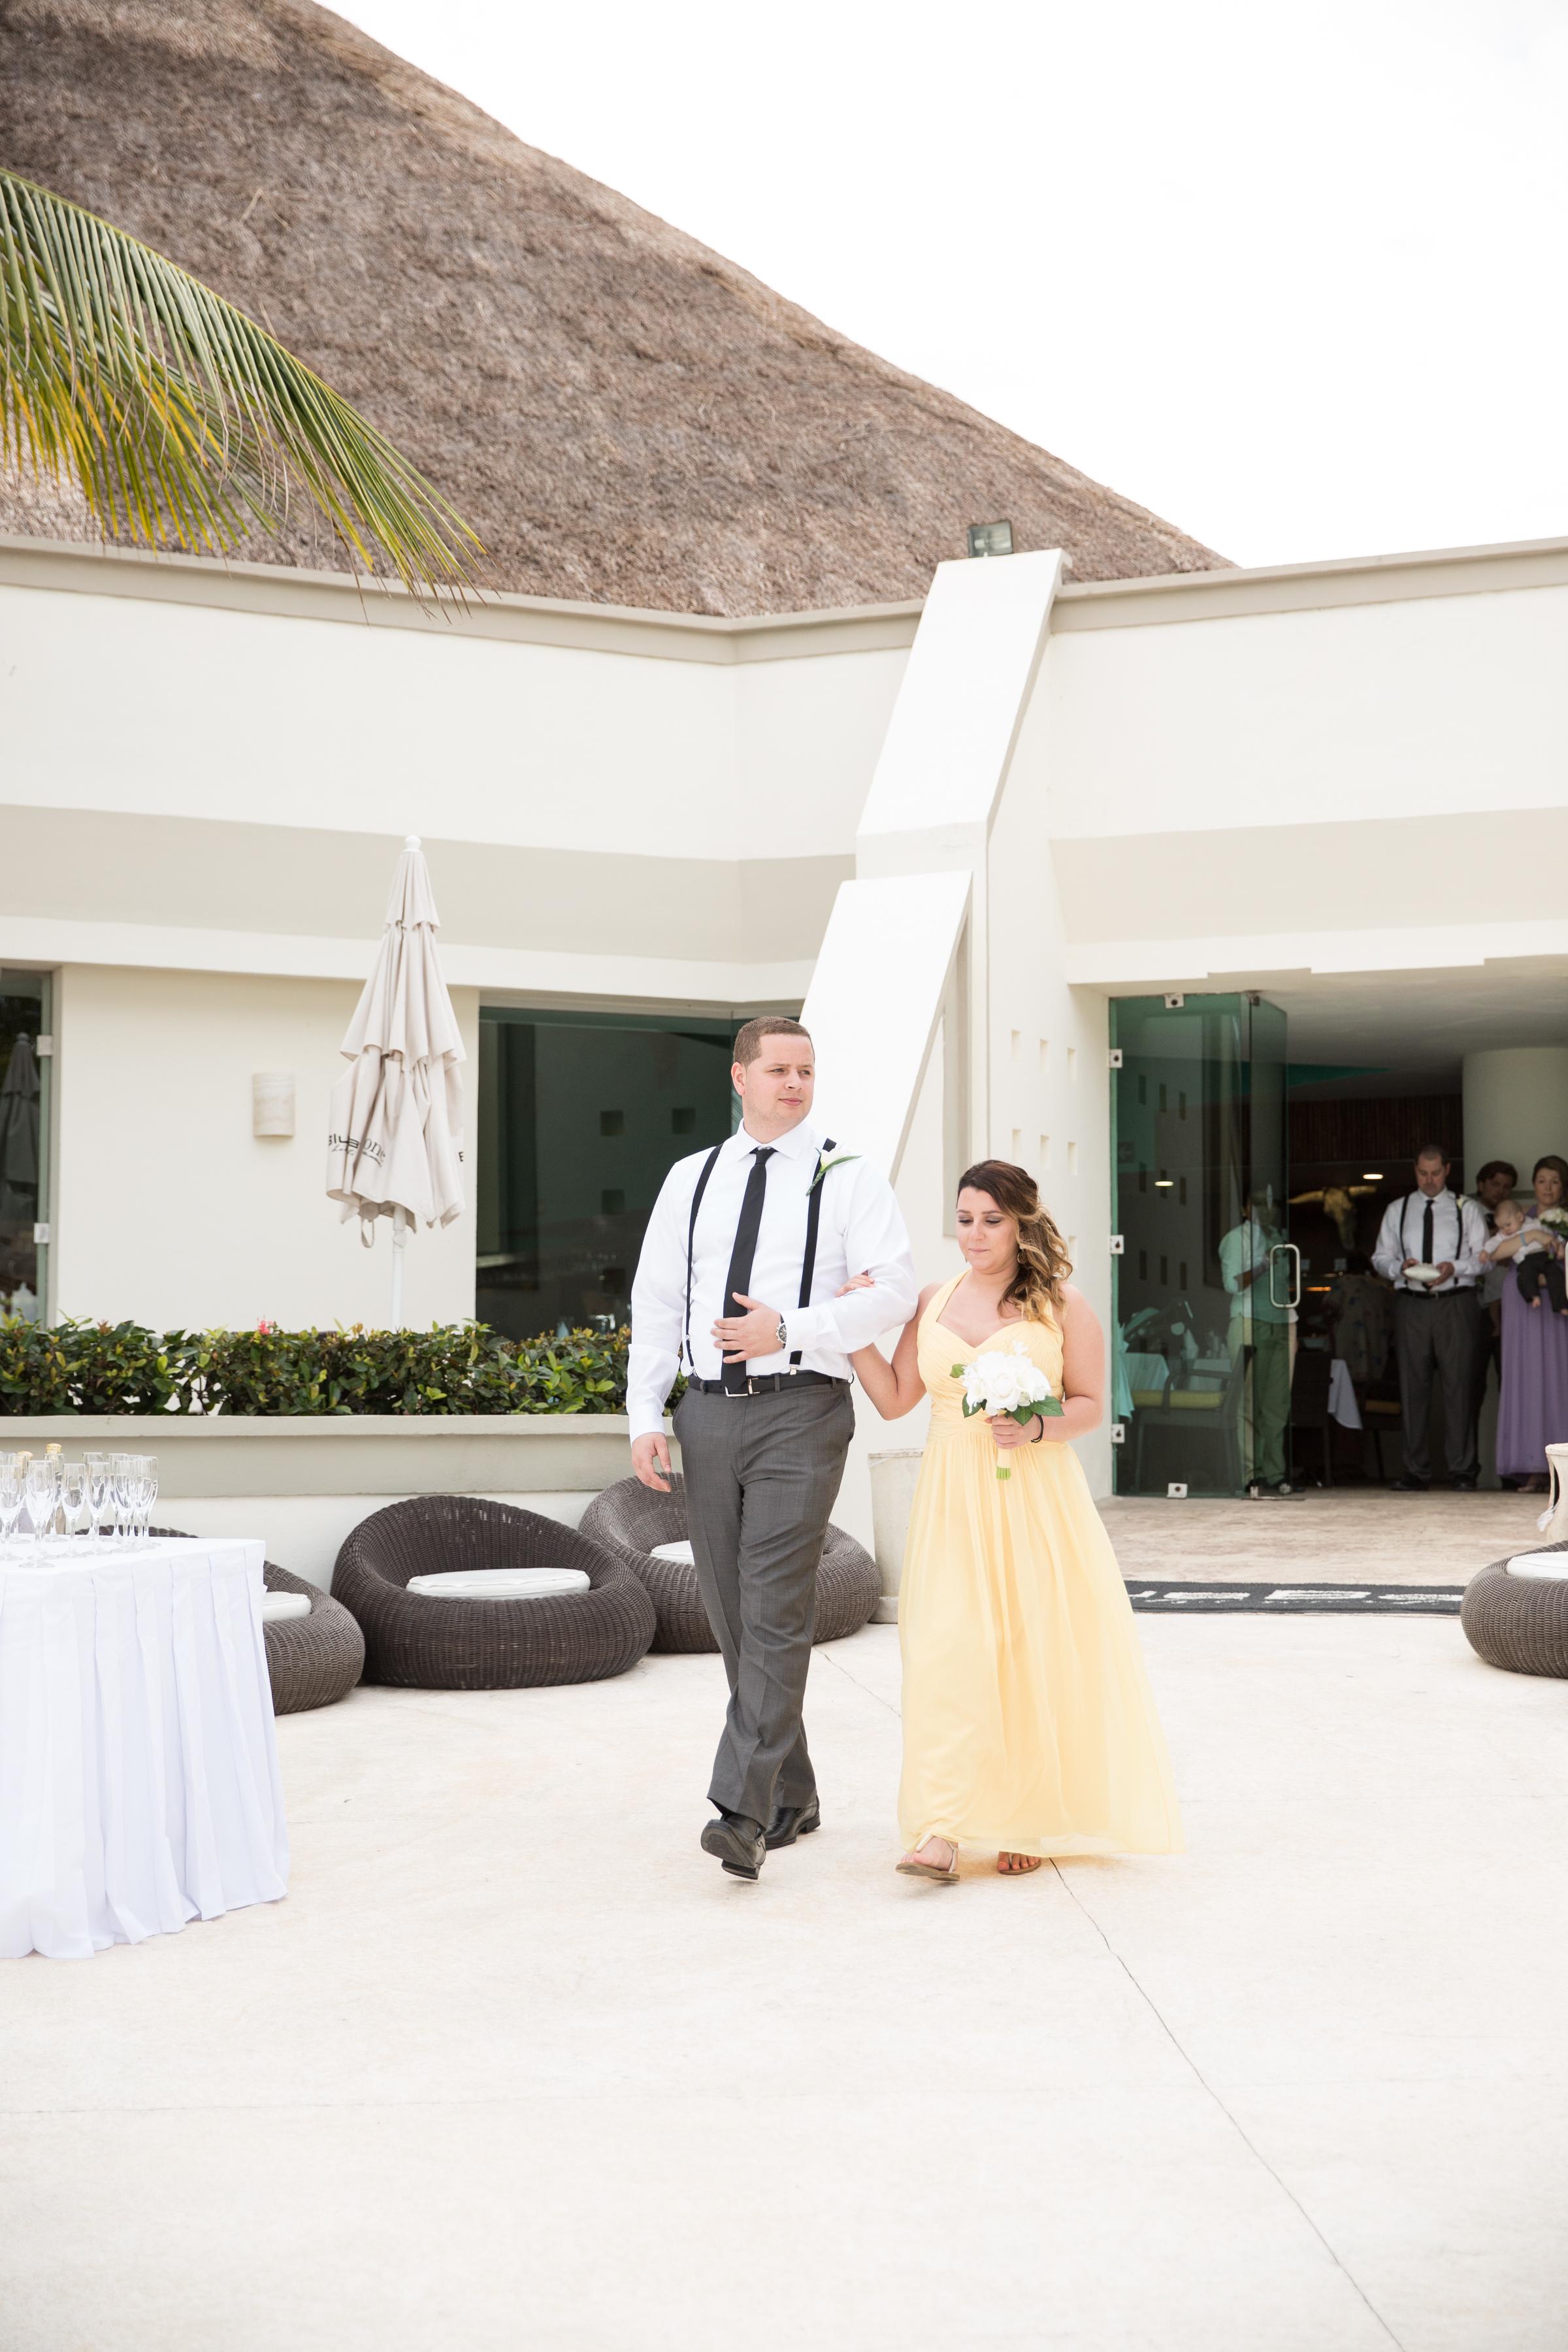 bridal party at wedding ceremony